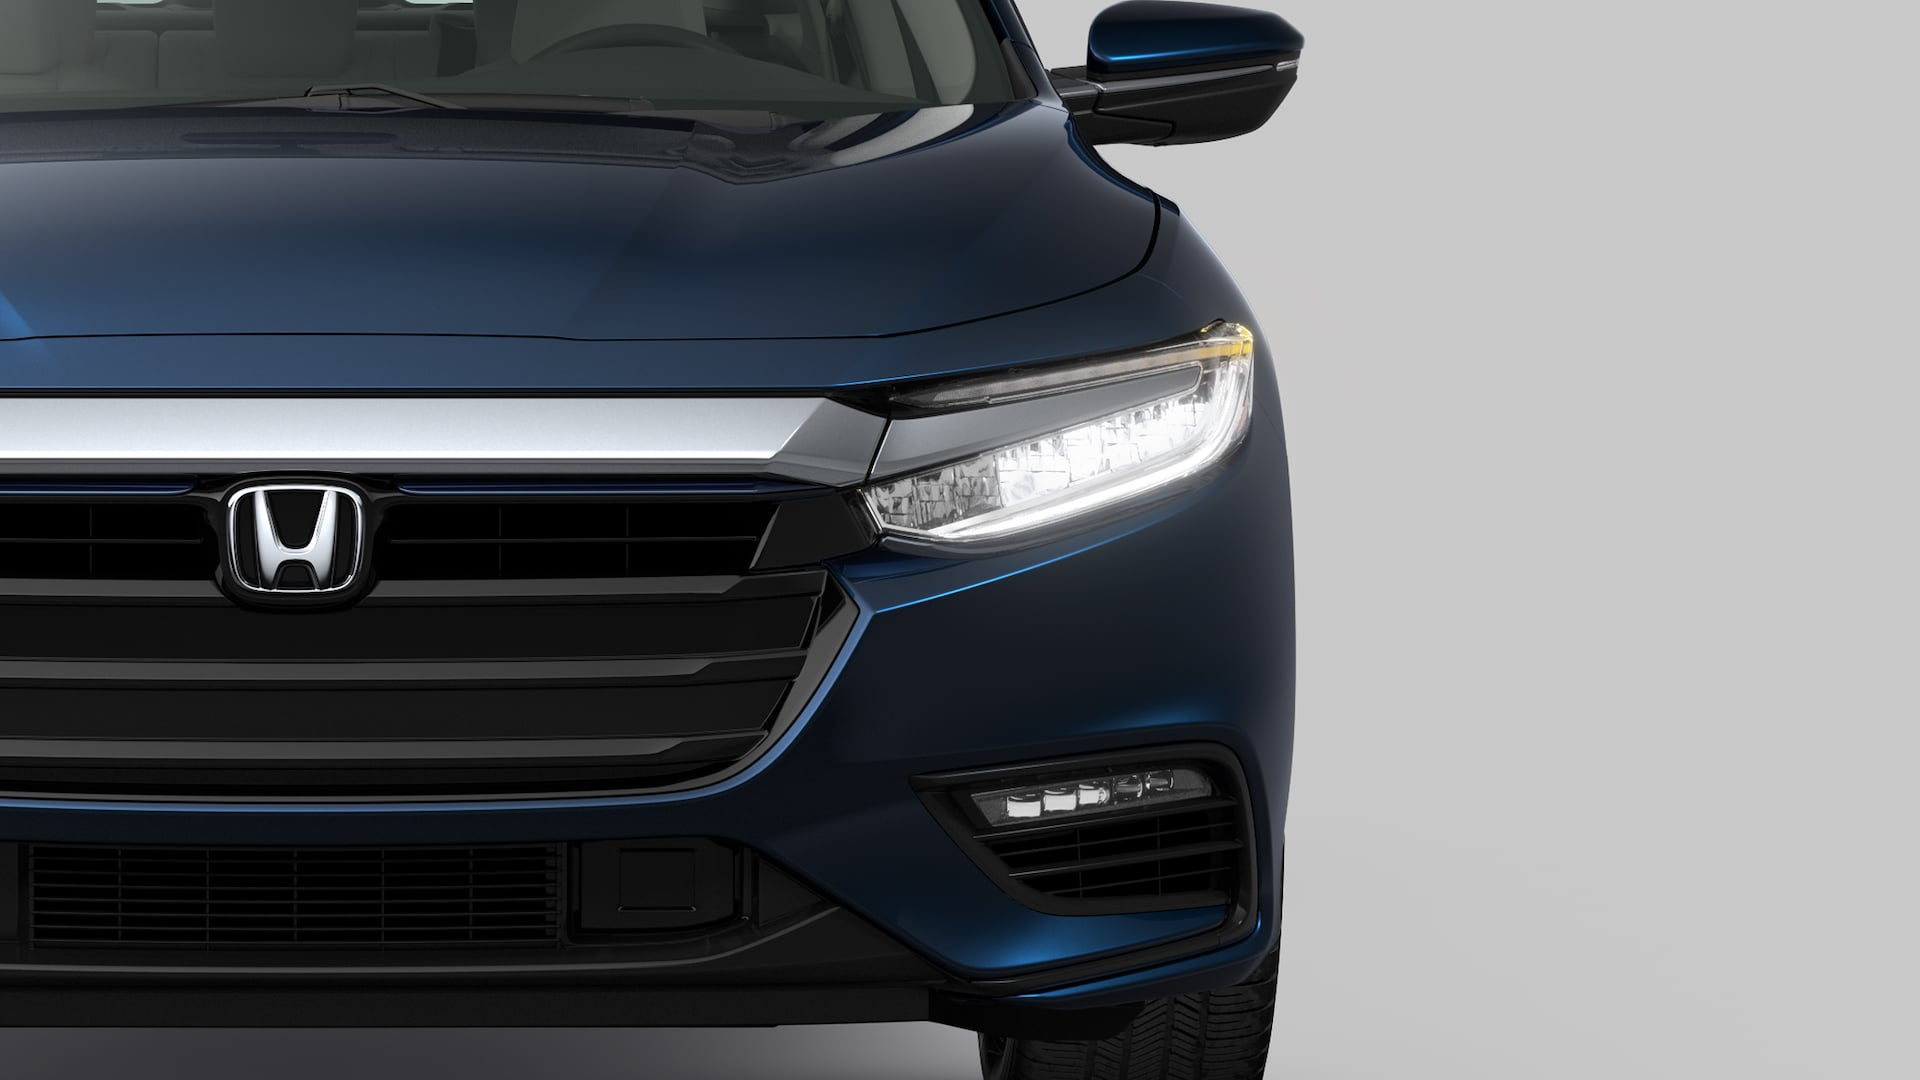 Vista frontal del Honda Insight2020 en Cosmic Blue Metallic.